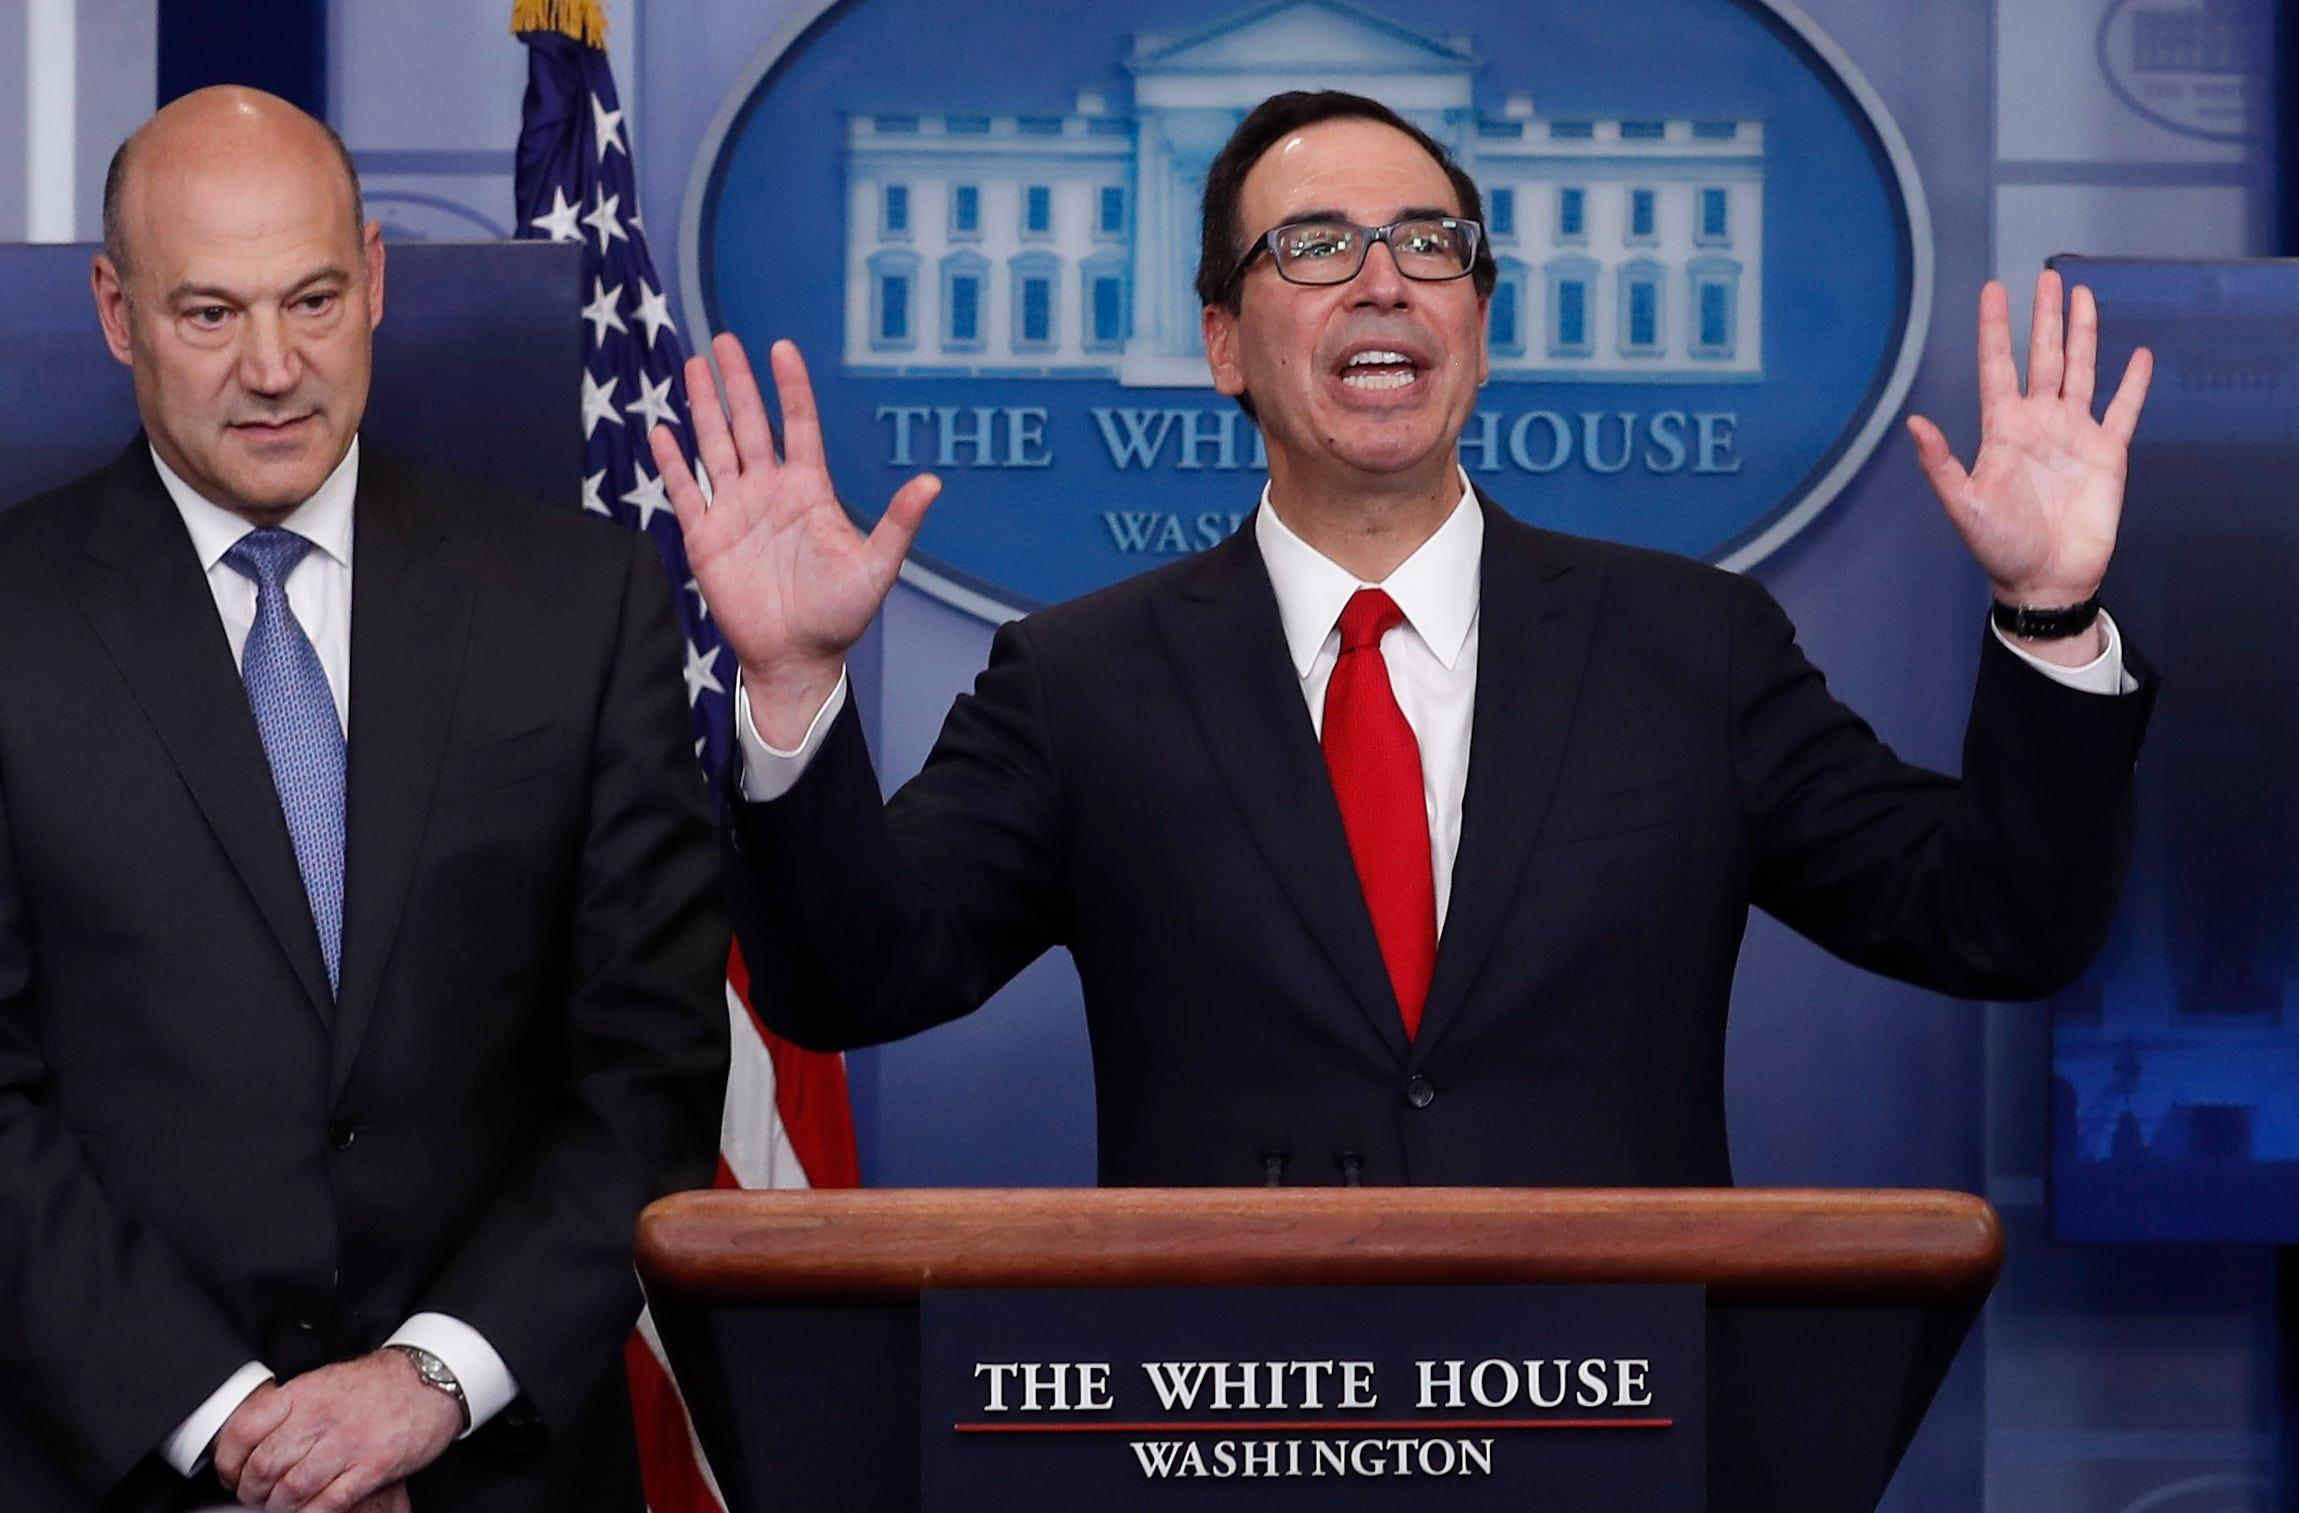 President Trump's tax plan could slash Trump's taxes